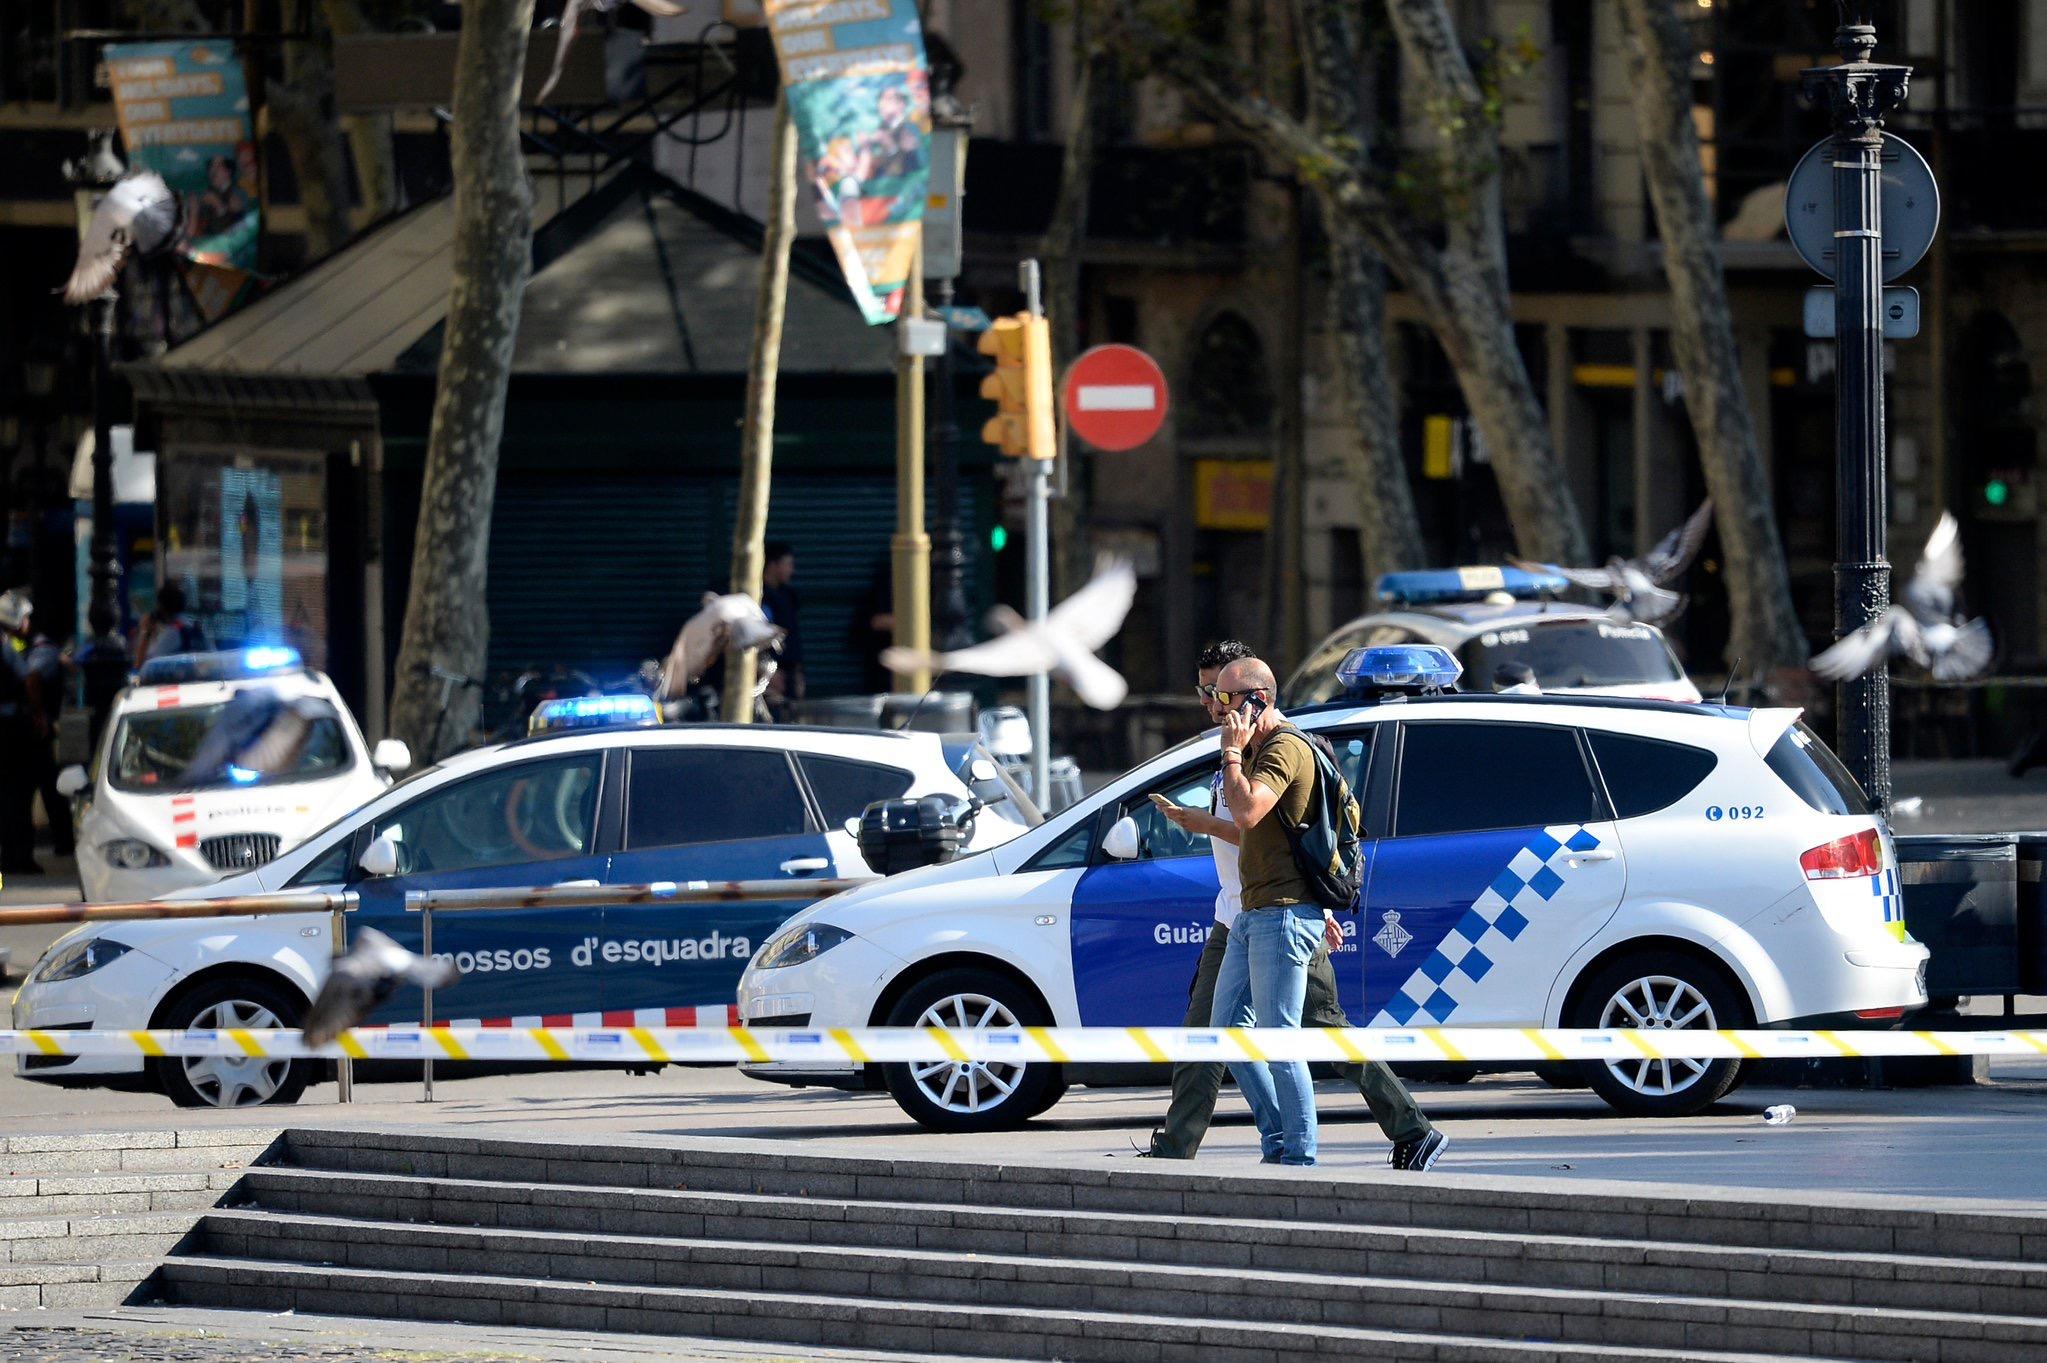 Attaque à Barcelone : La police n'est plus sûre de la piste terroriste